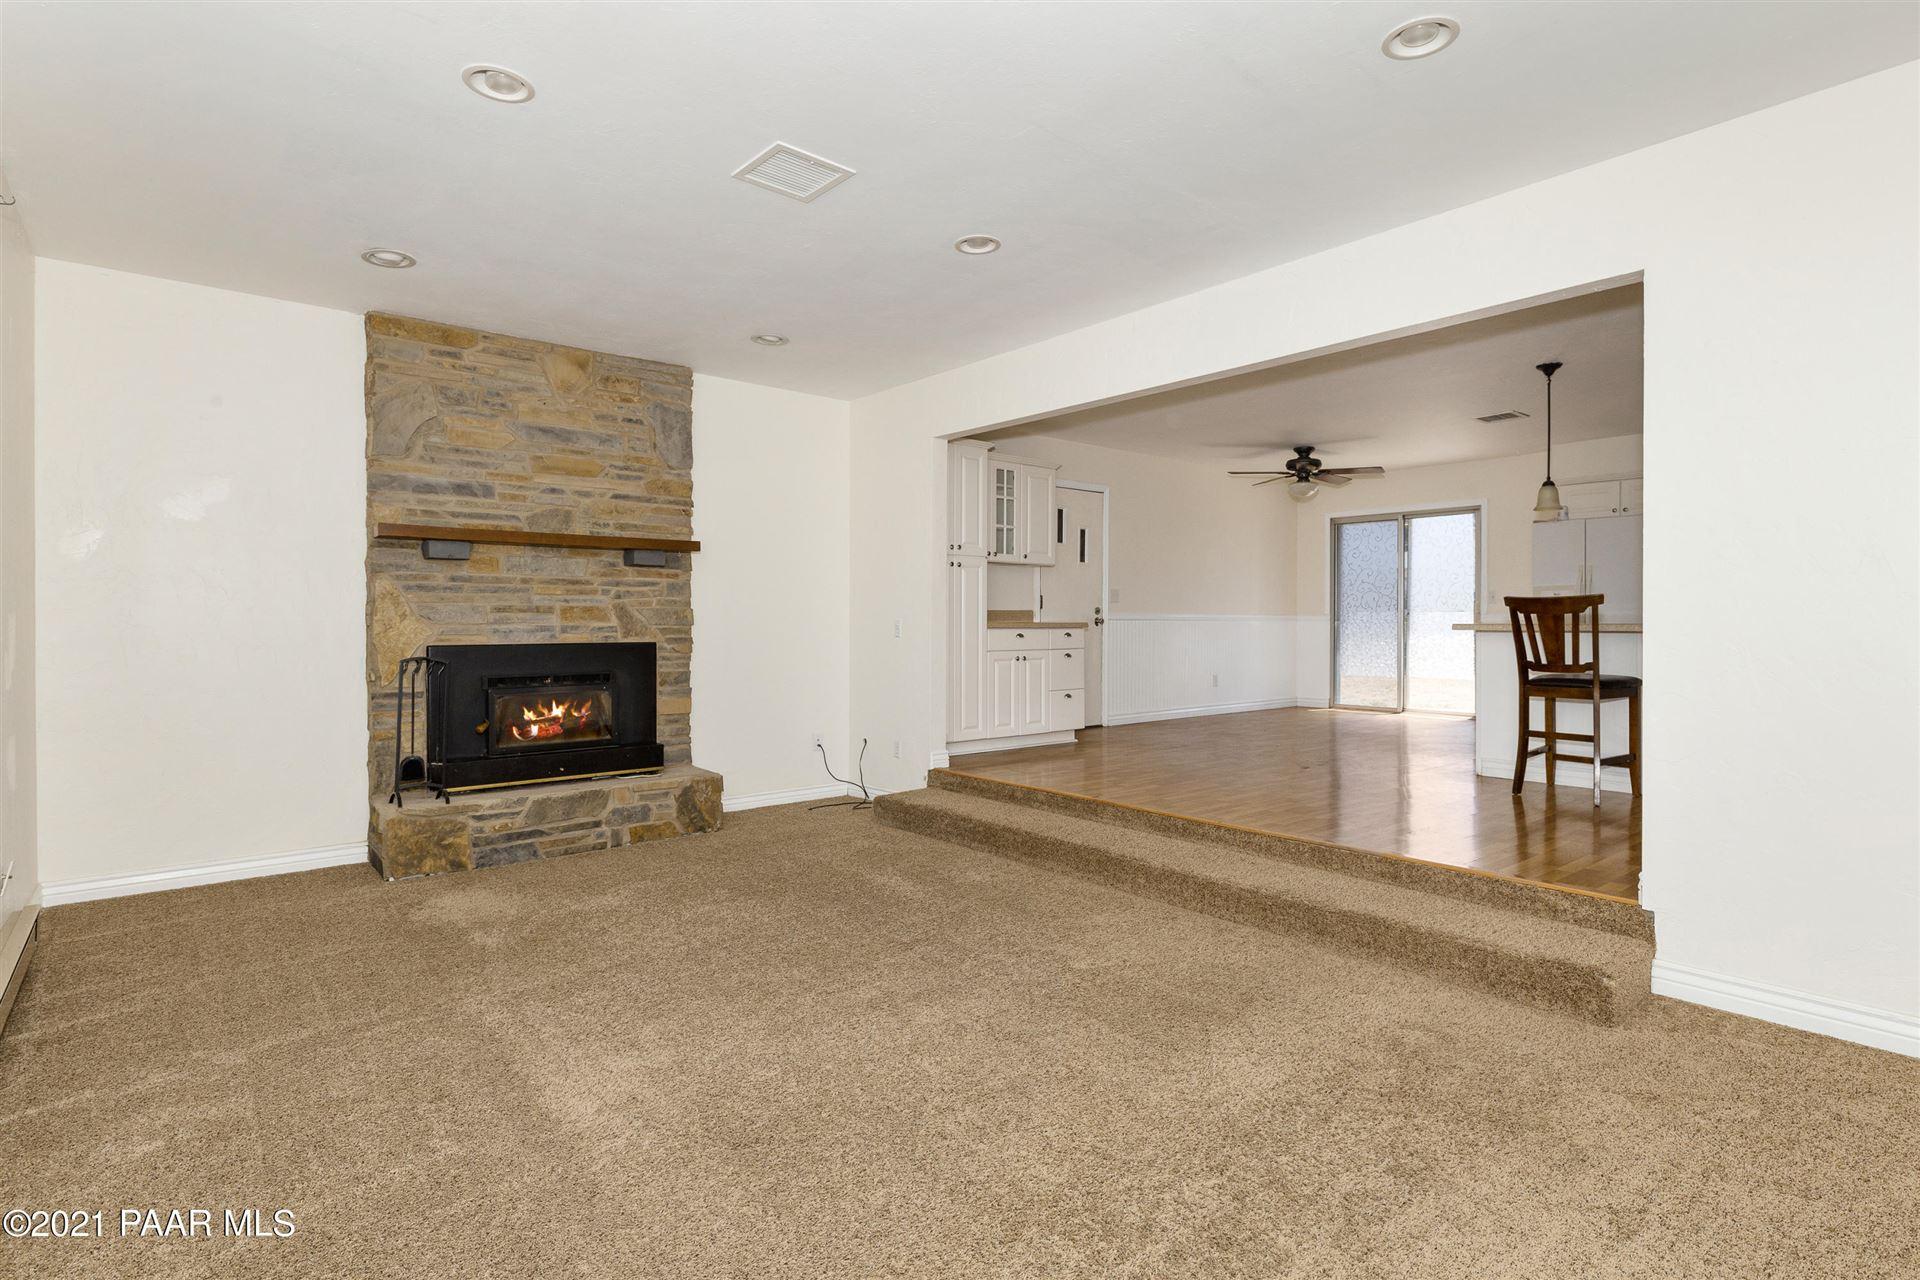 Photo of 363 W Tamarack Lane #Lot: 55, Prescott, AZ 86301 (MLS # 1037658)